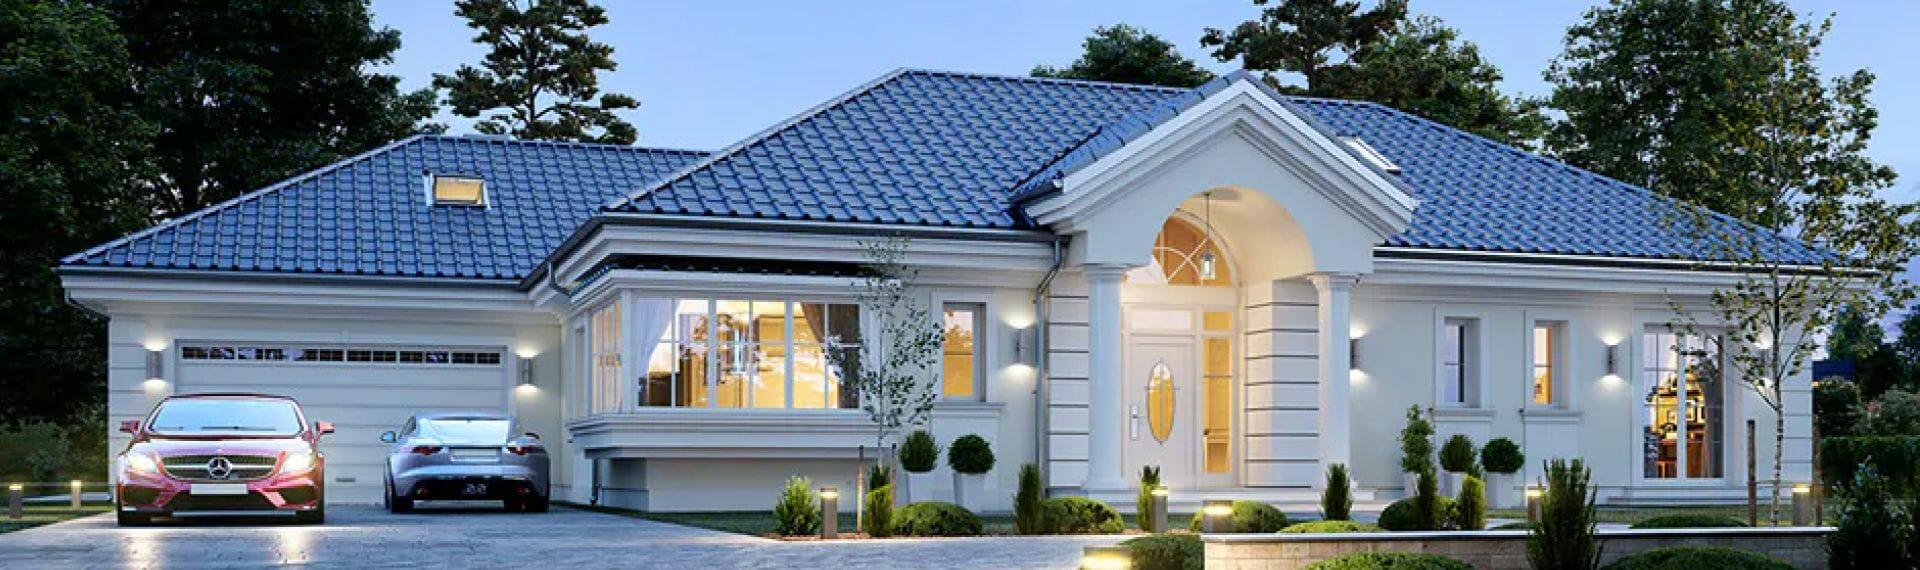 The Benefits of Regular Roof Maintenance